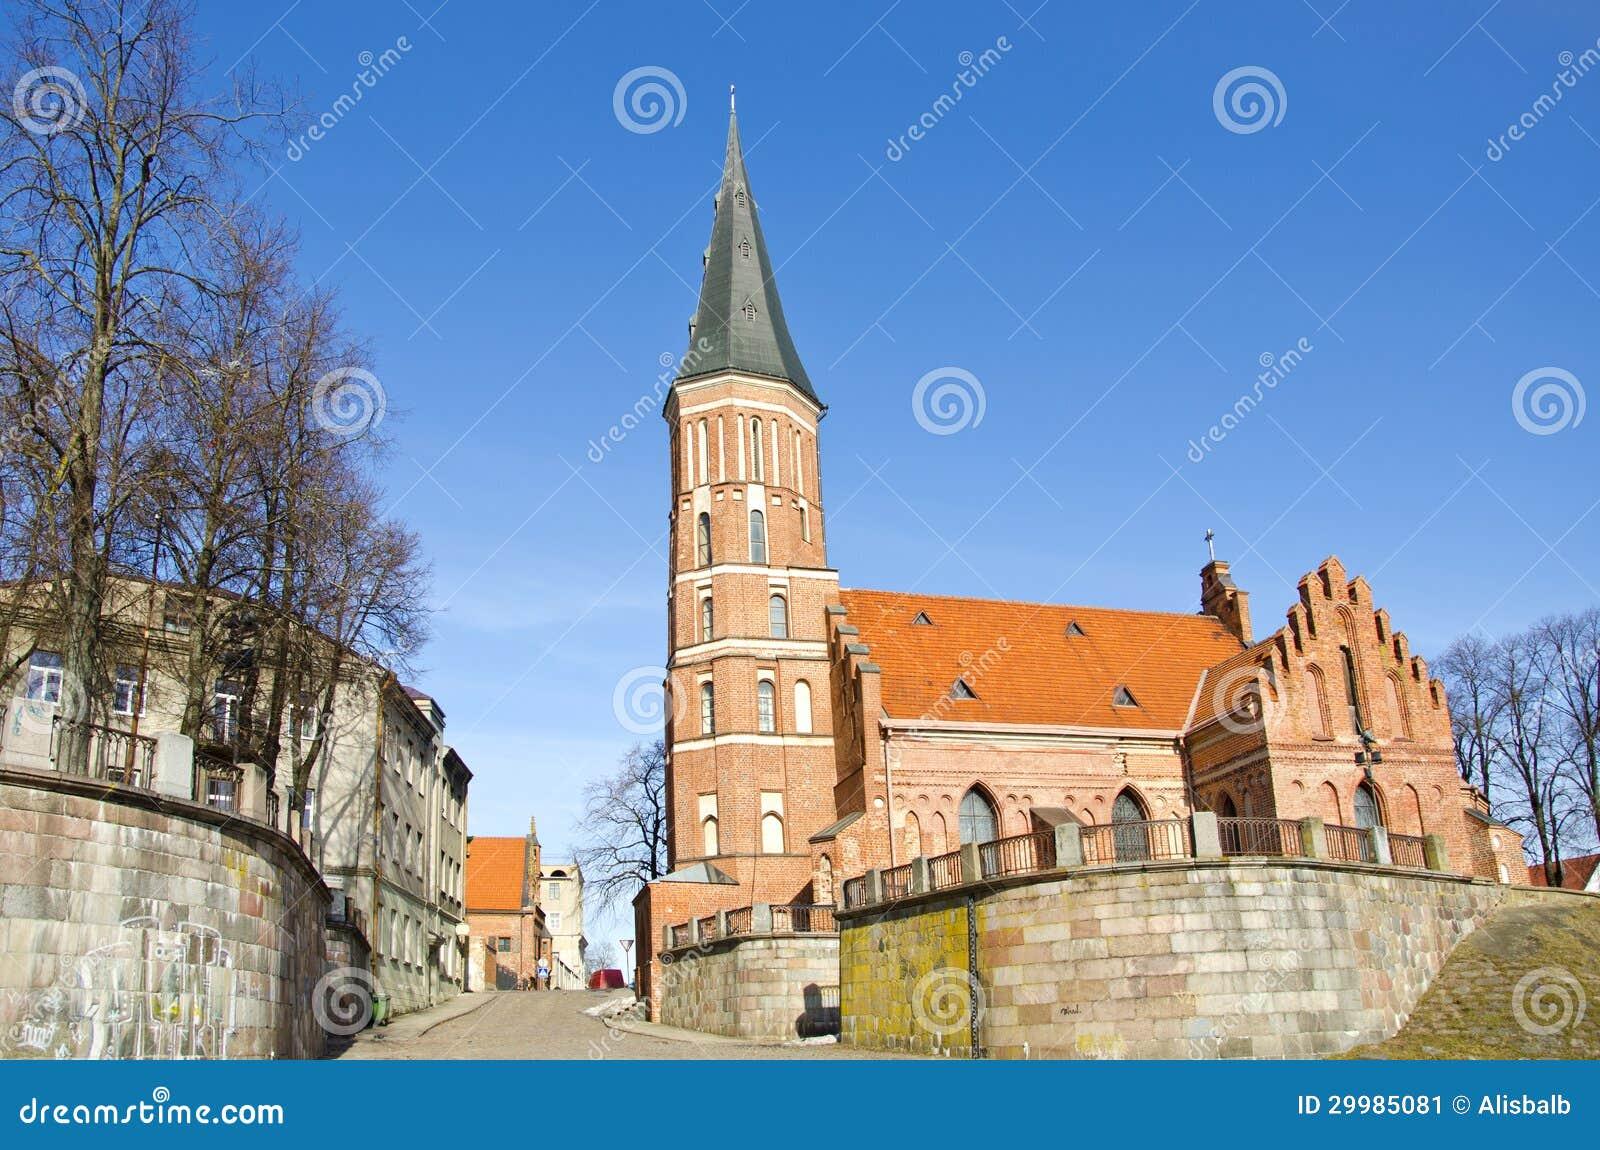 Historical Vytautas church in Kaunas, Lithuania